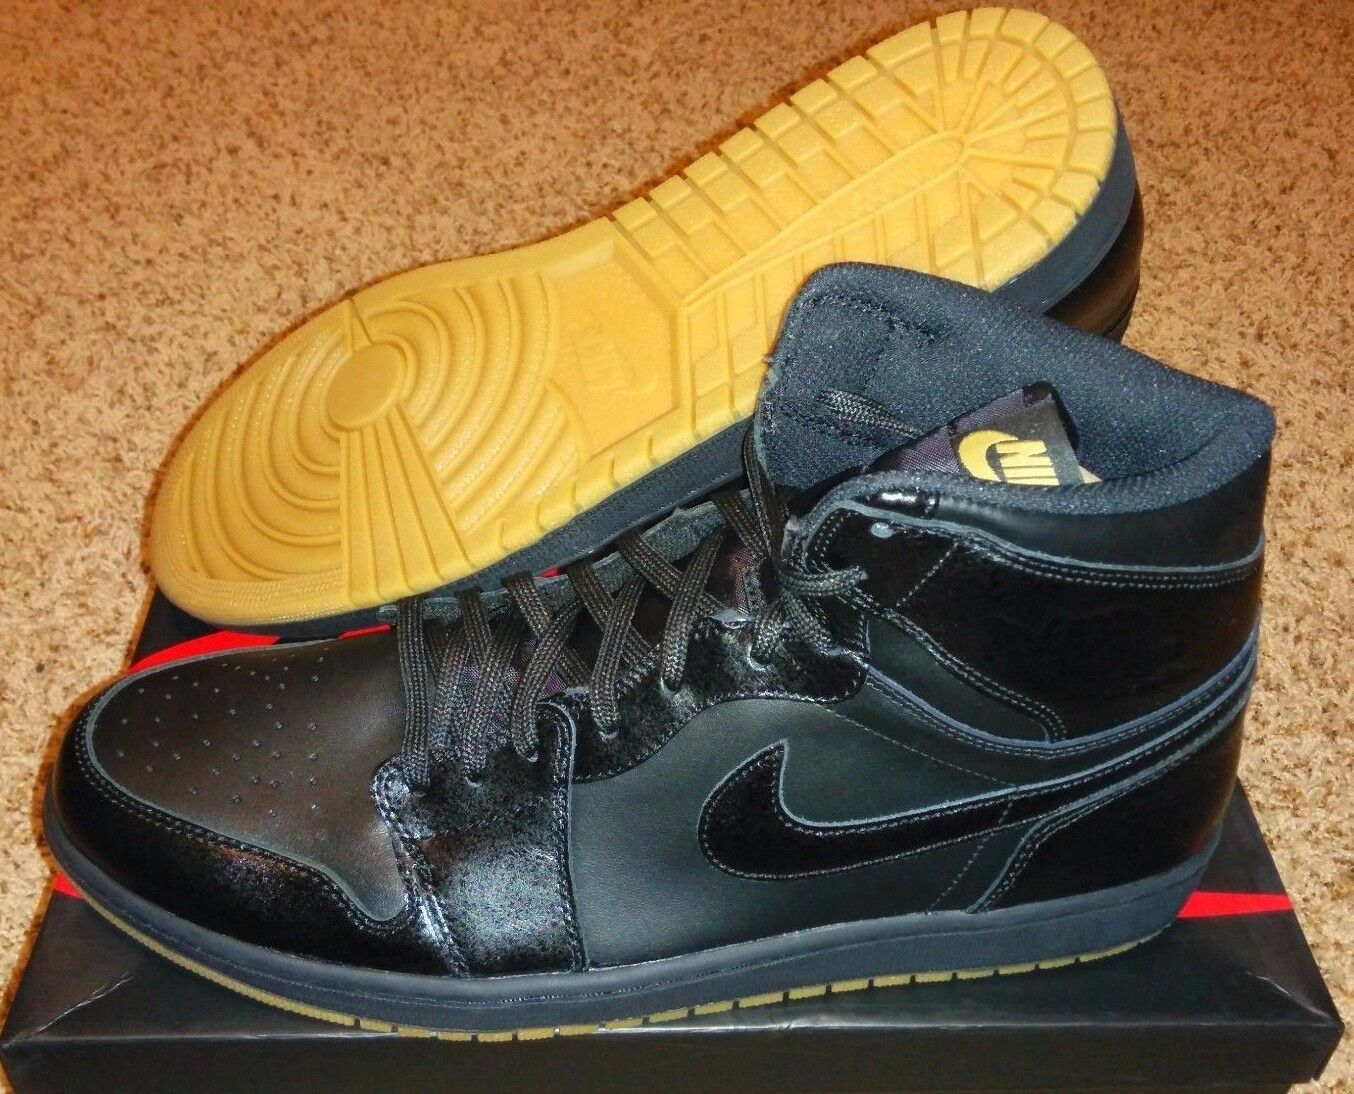 Nike air jordan 1 og nero / gomma basso alto frammento melo pinnacle ovo sz 15